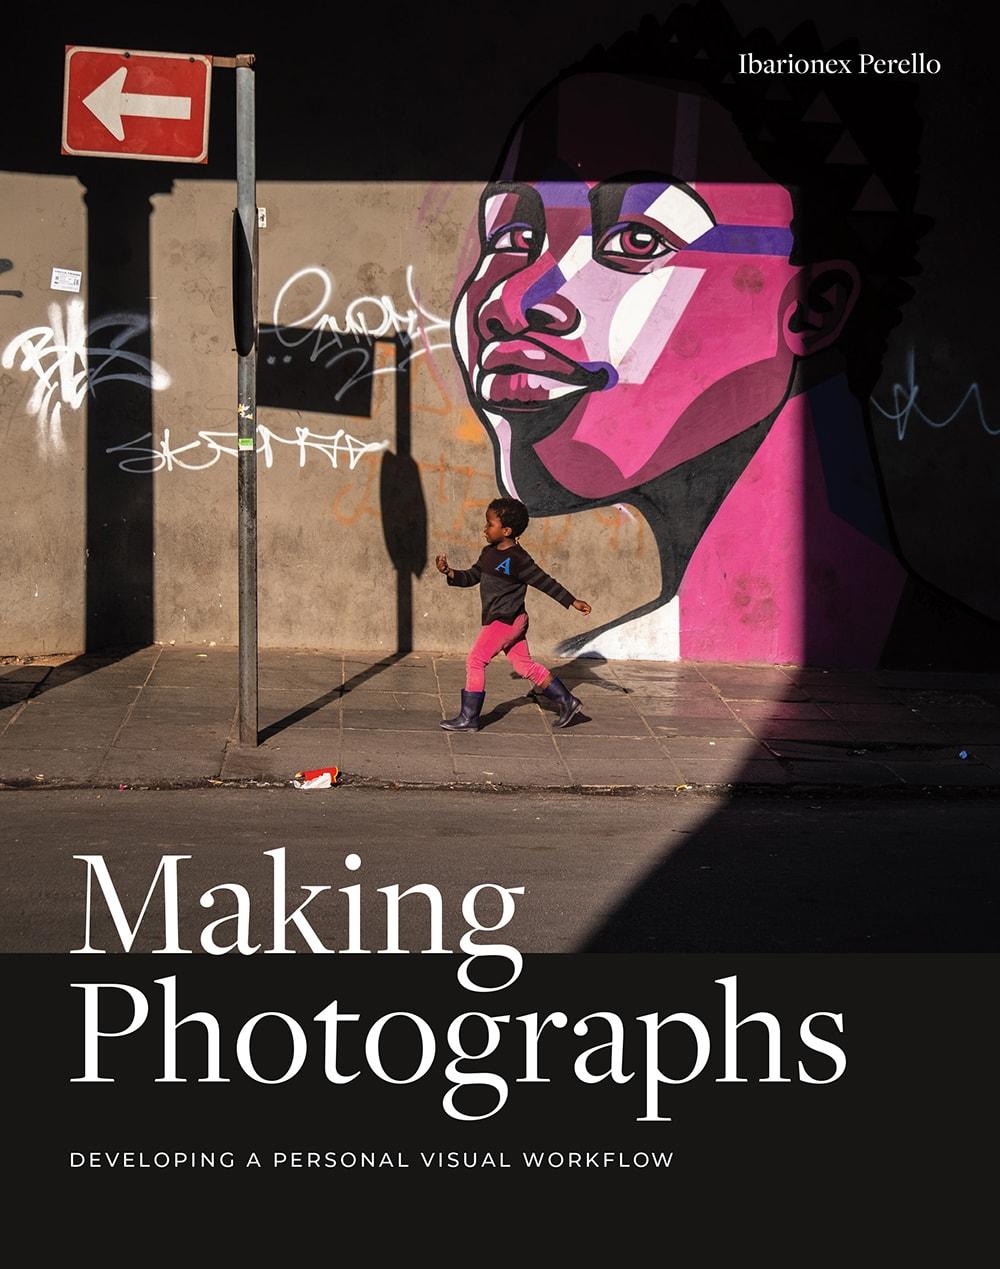 Ibarionex Perello's Making Photographs